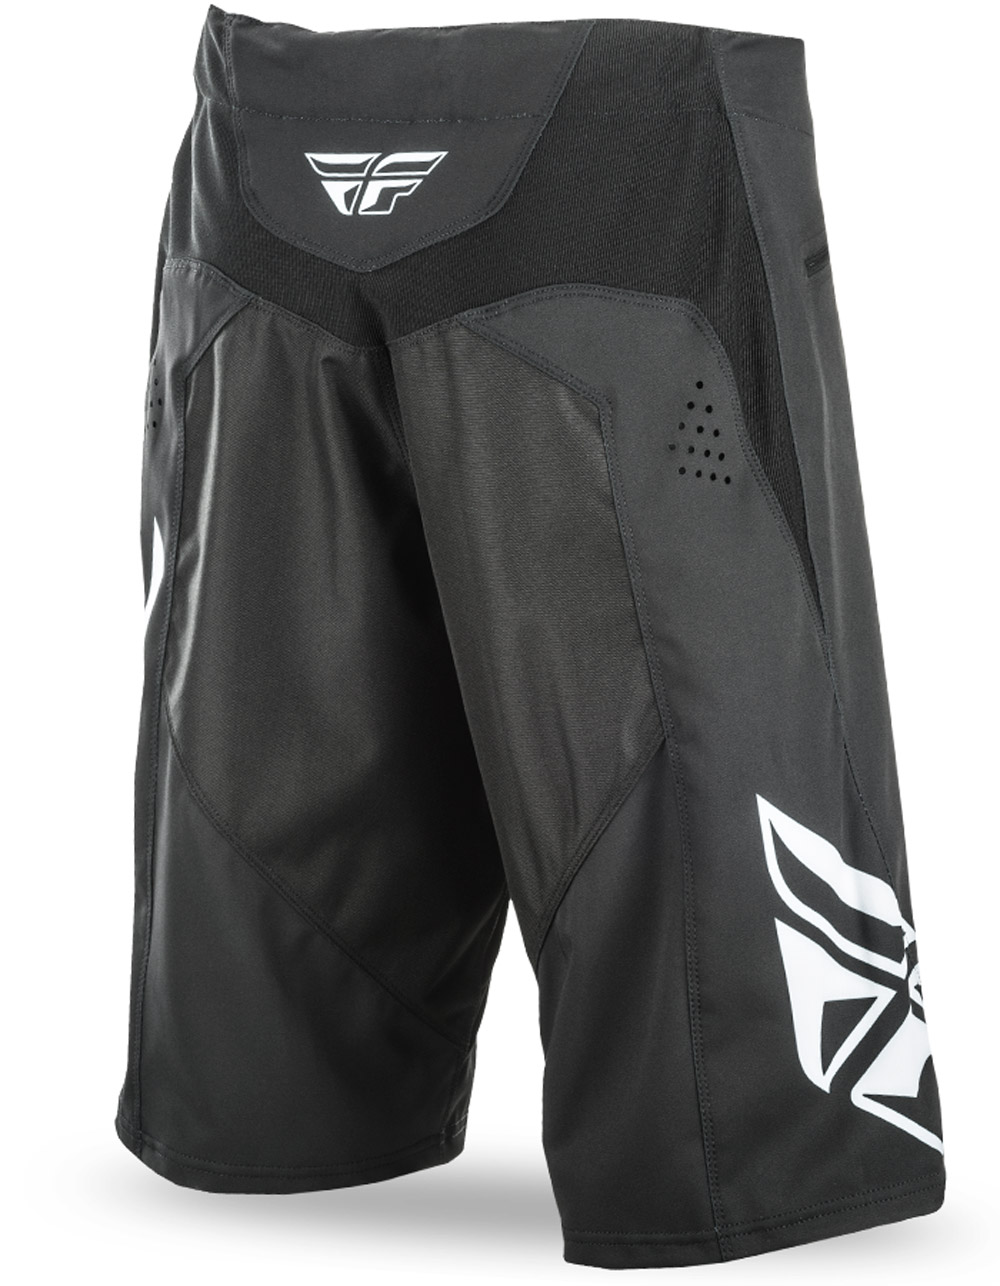 Fly-Racing-2017-Radium-Bike-Shorts-Mens-All-Sizes-amp-Colors thumbnail 3